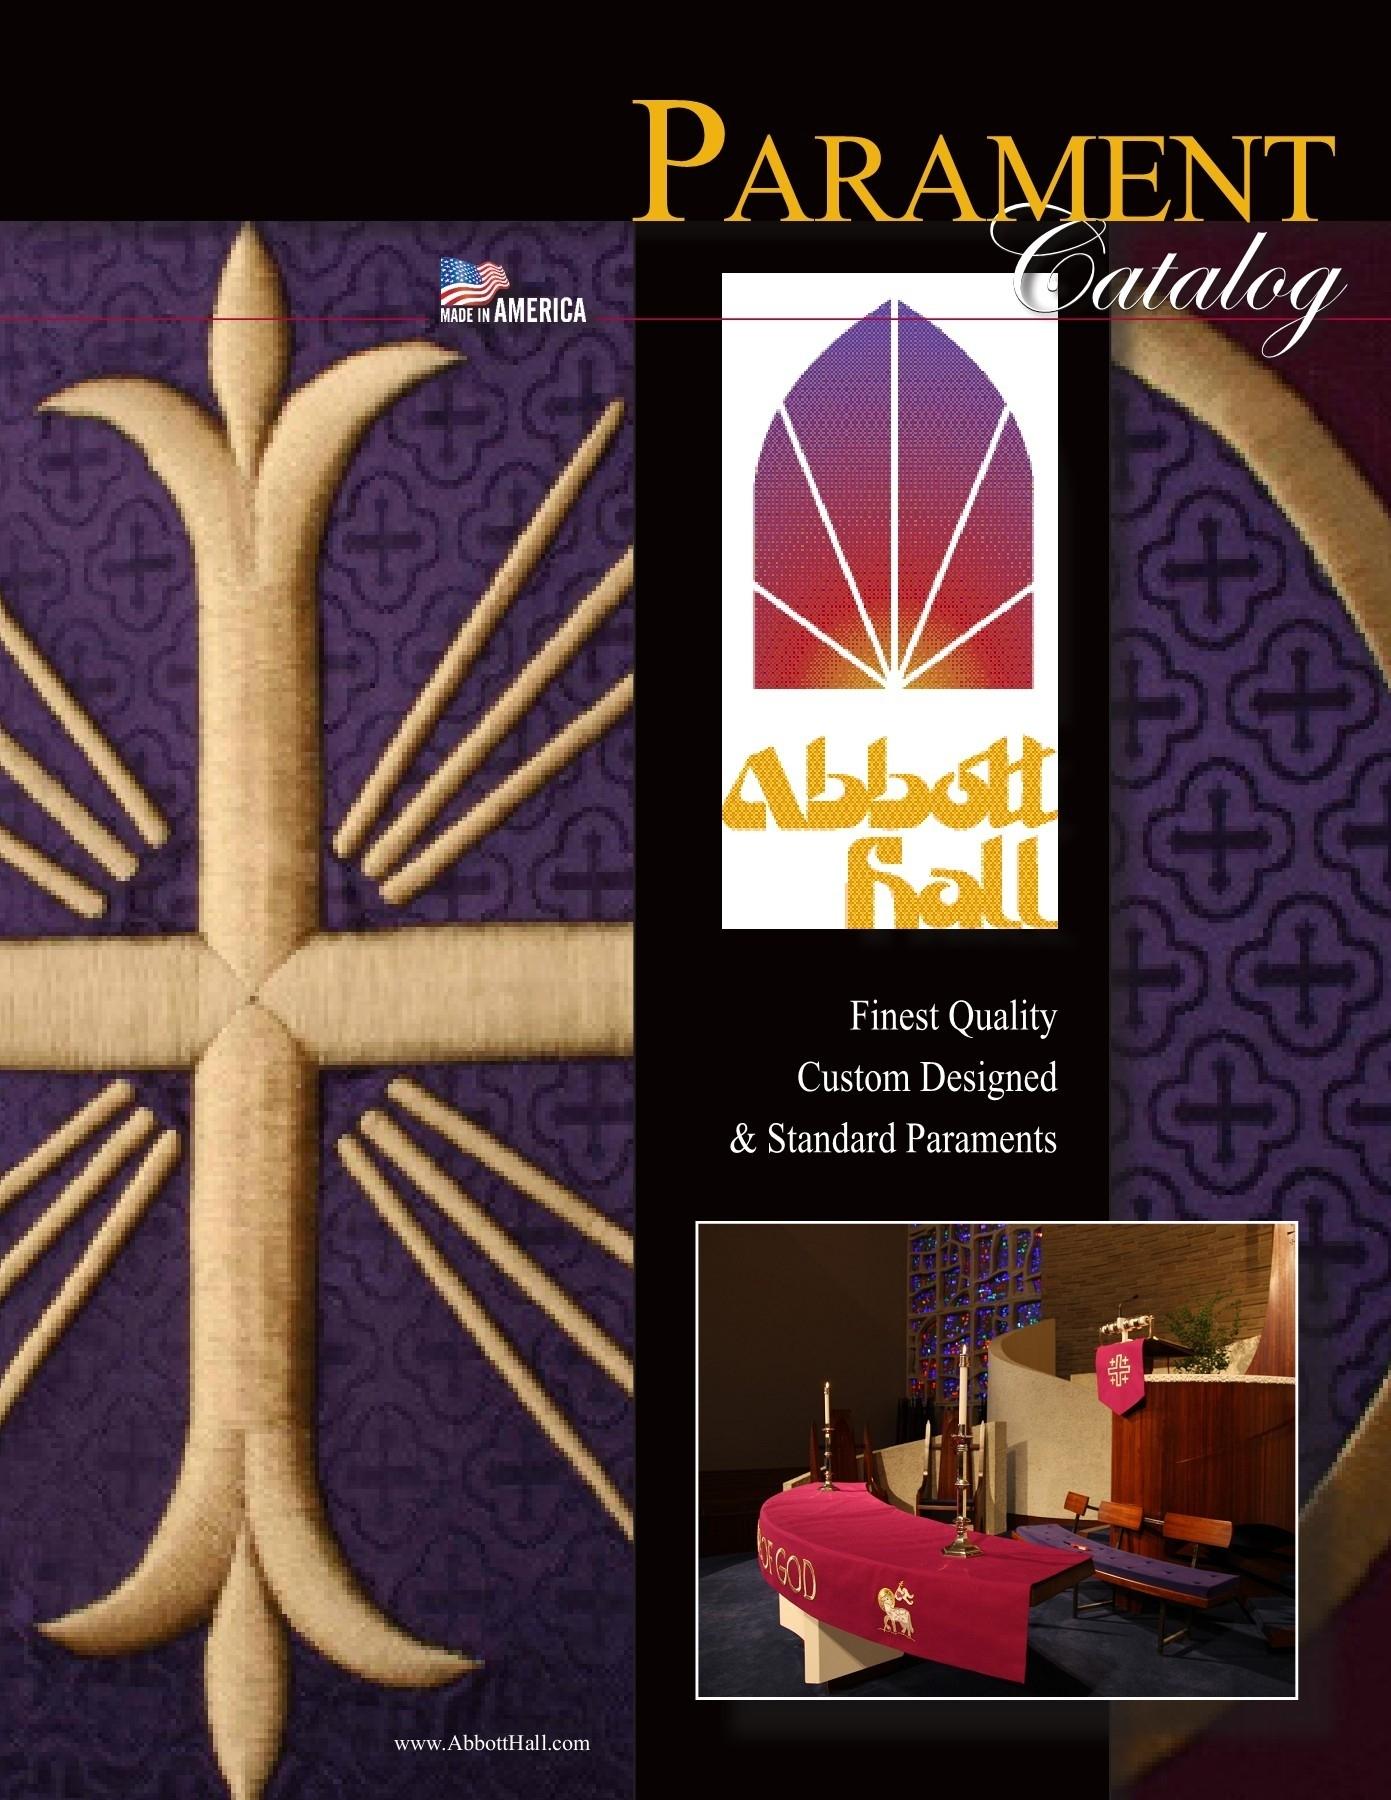 Abbott Hall Parament Catalog-Flip Book Pages 1-50 | Pubhtml5